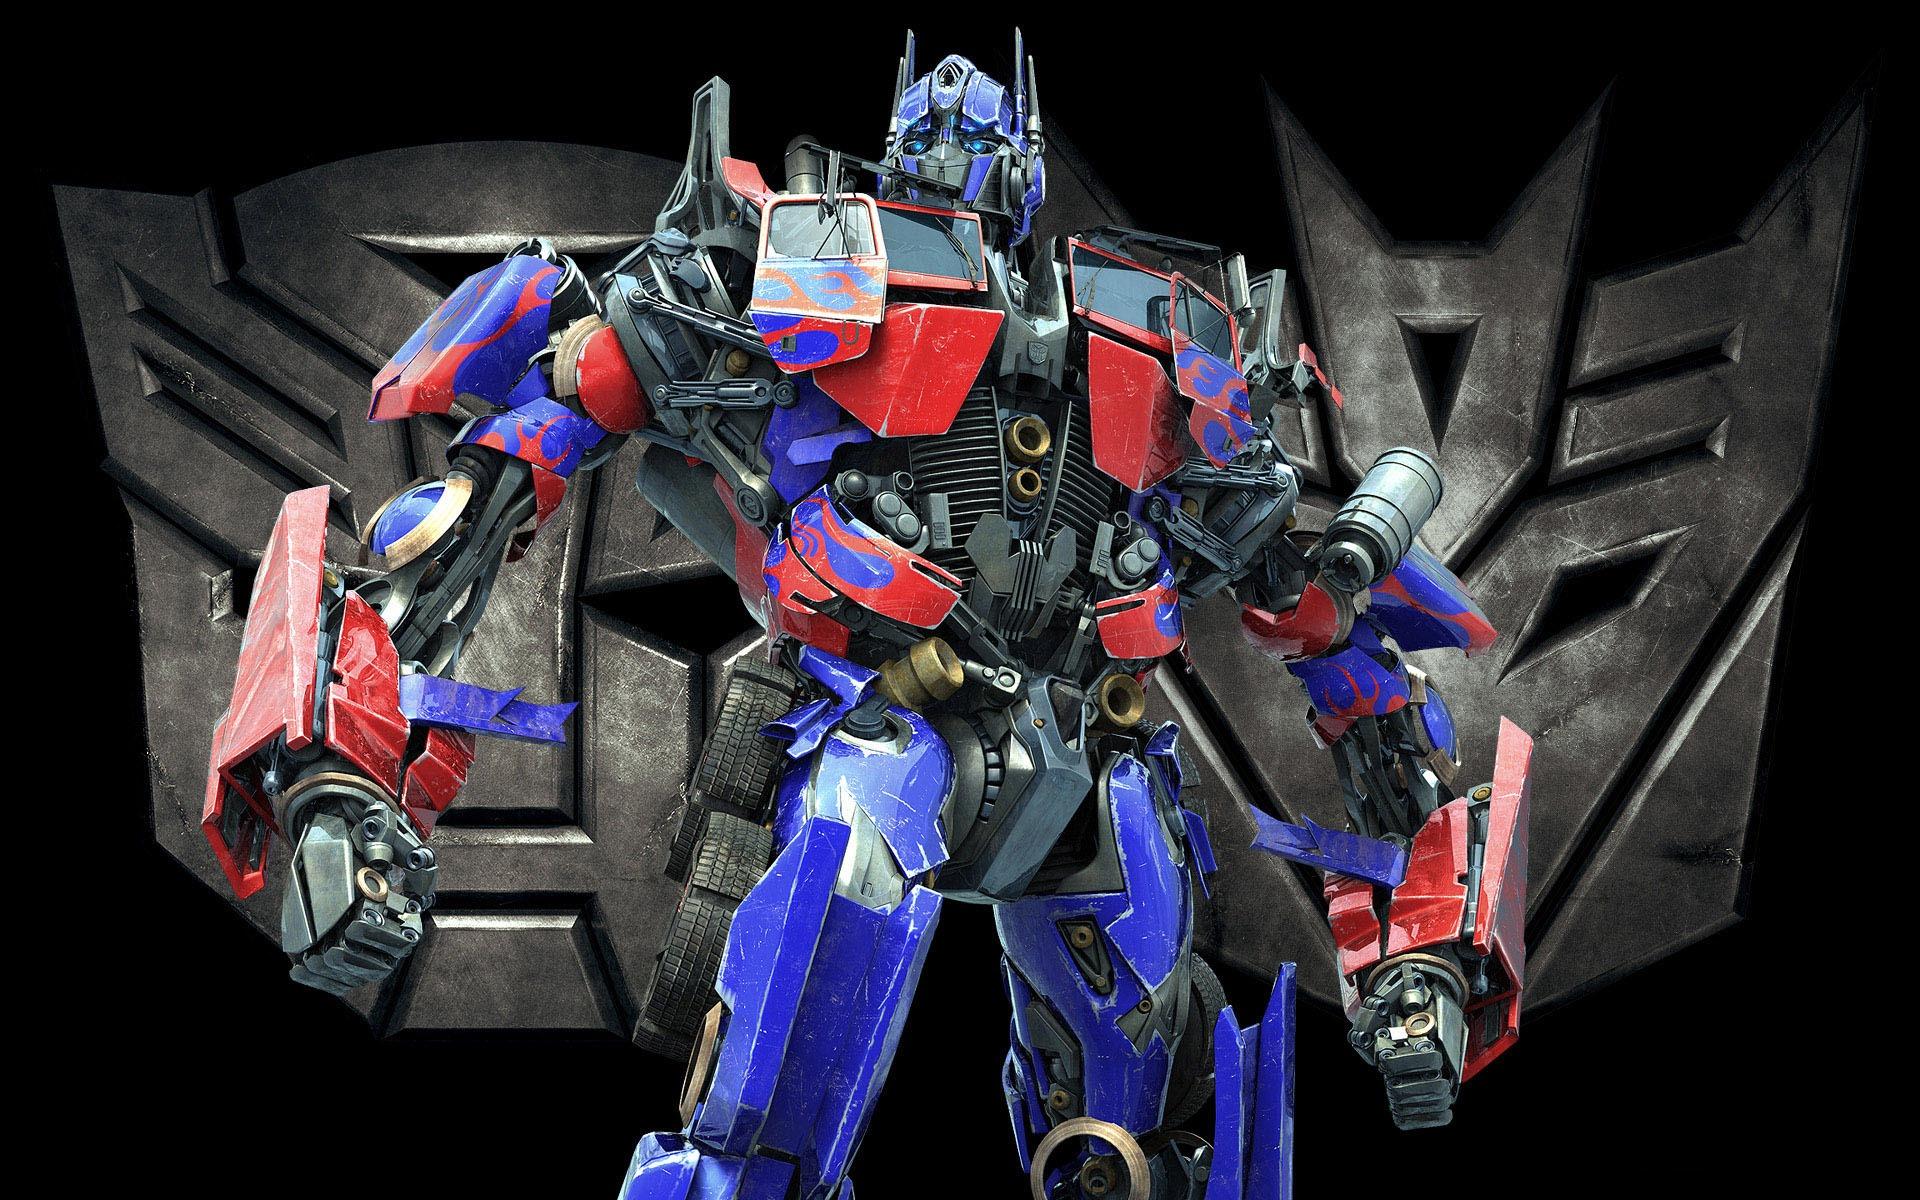 Transformers Wallpaper (2) #1